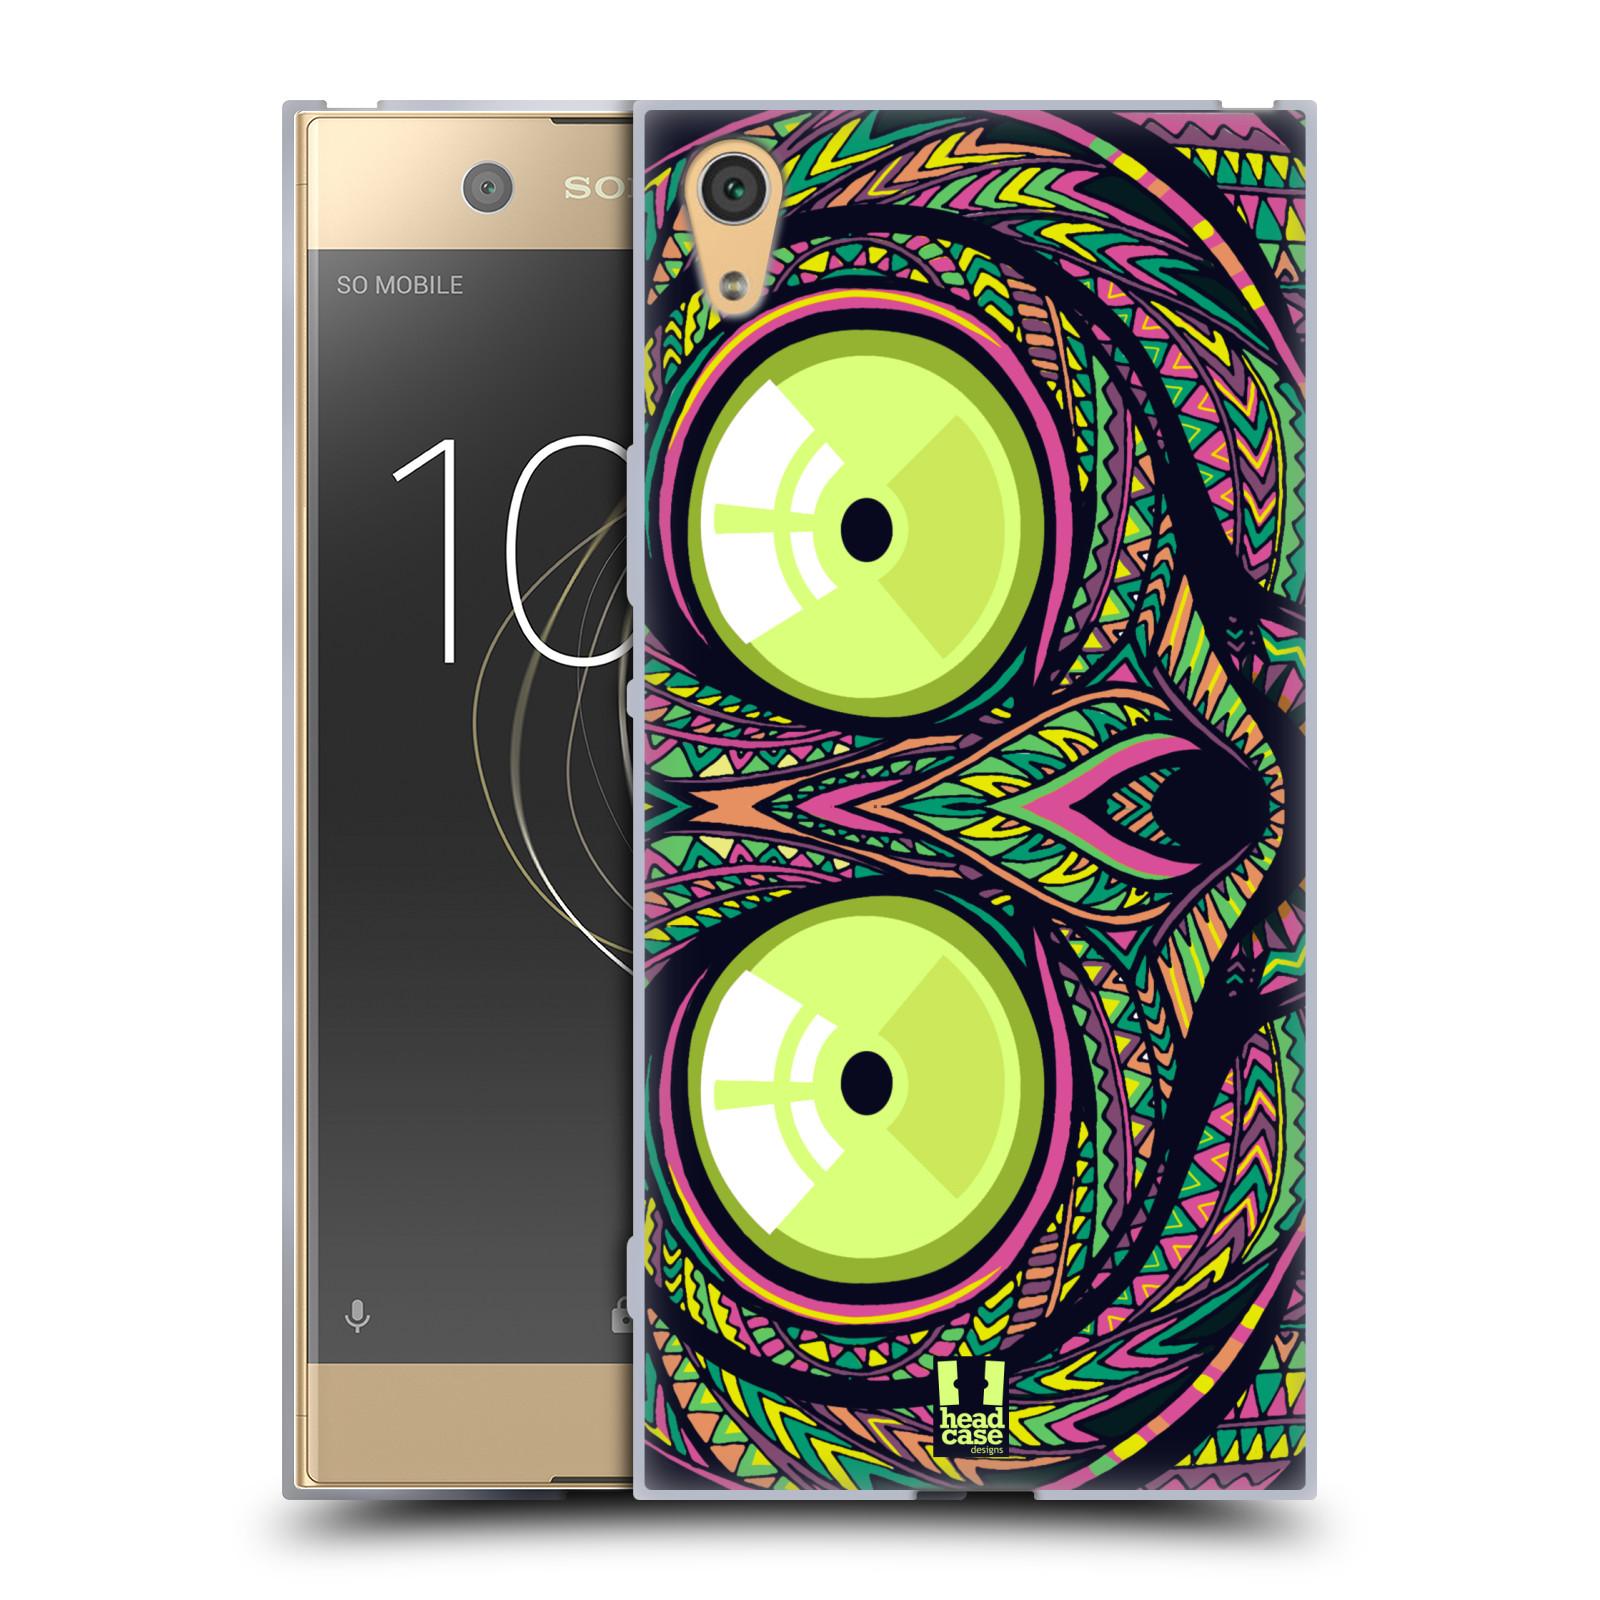 Silikonové pouzdro na mobil Sony Xperia XA1 Ultra - Head Case - AZTEC NÁRTOUN